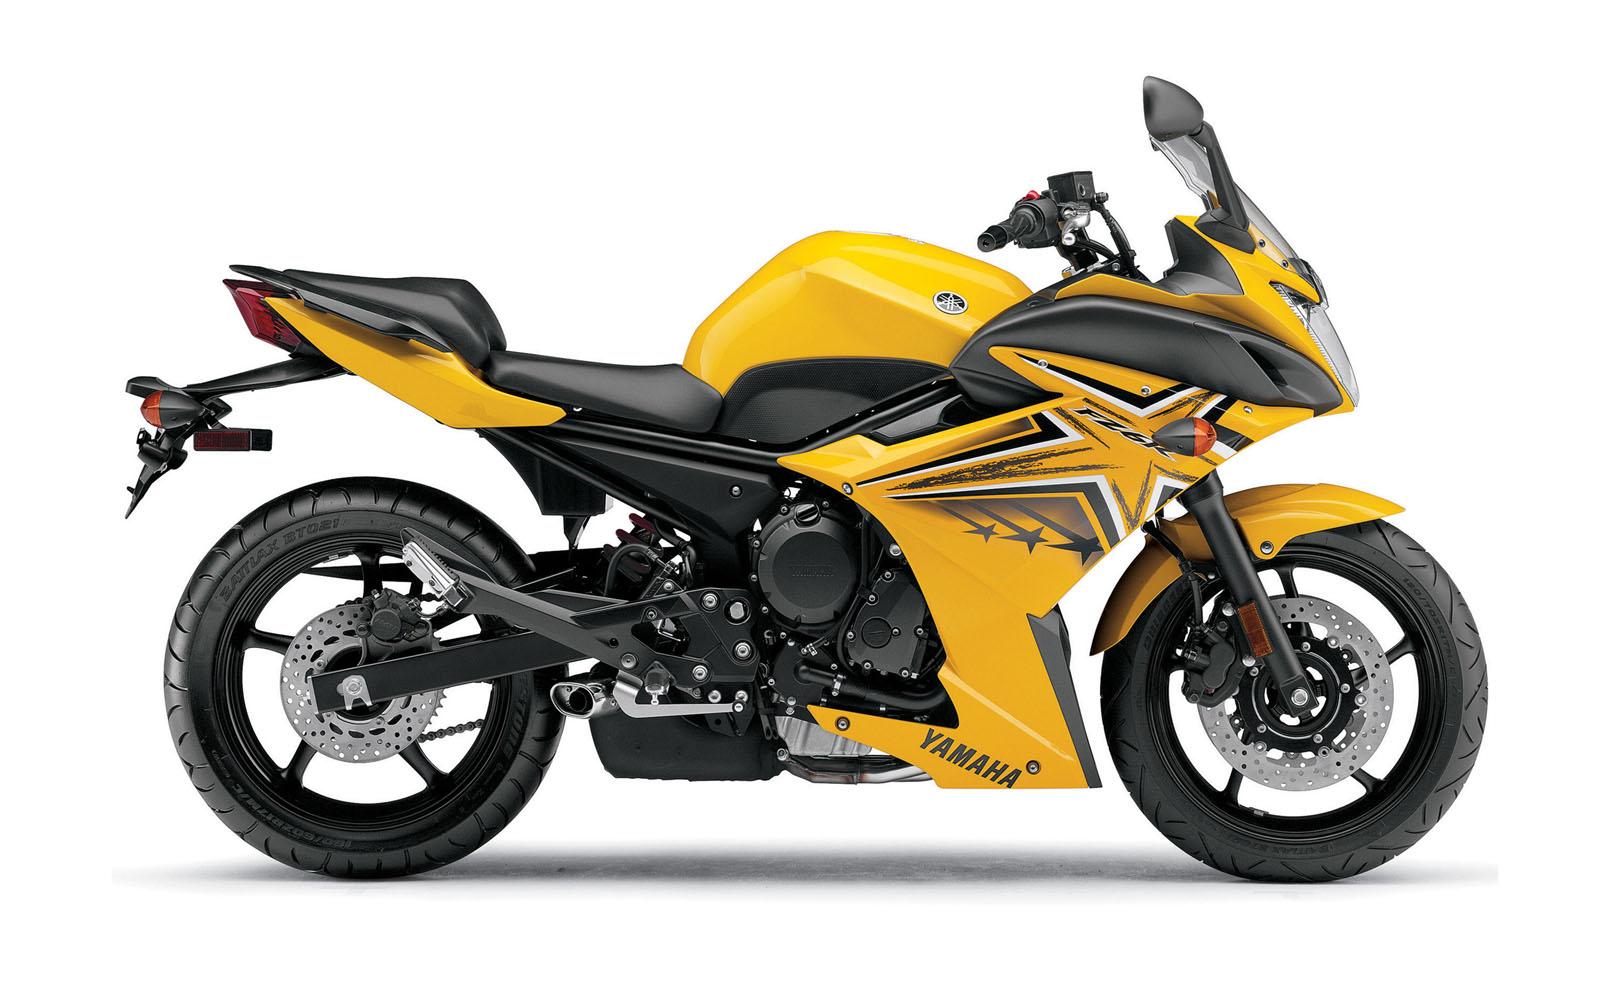 FZ6R Motorcycle Desktop Wallpapers Yamaha FZ6R Motorcycle Desktop 1600x1000